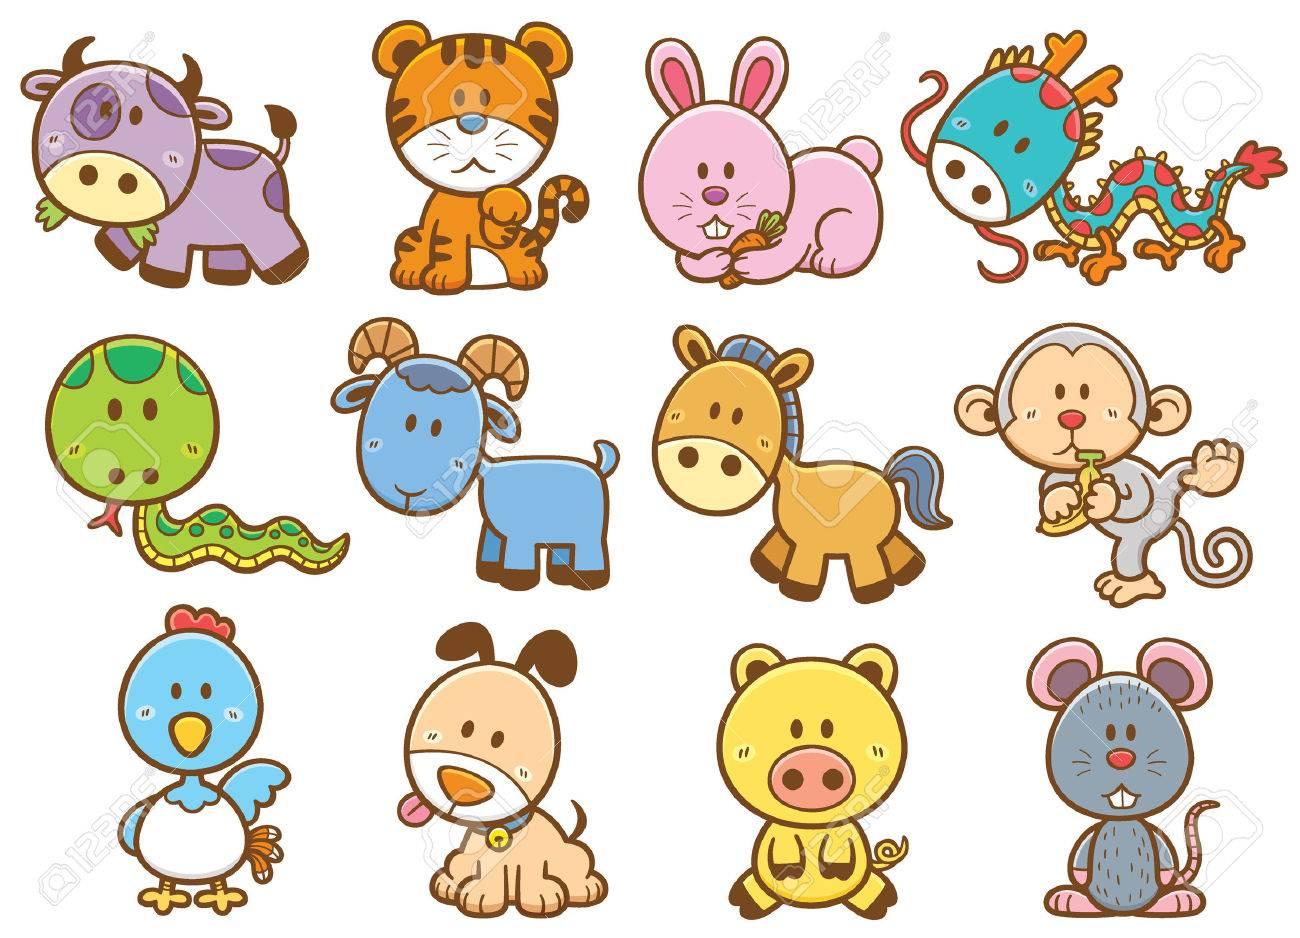 Vector illustration of Chinese Zodiac animal cartoon.